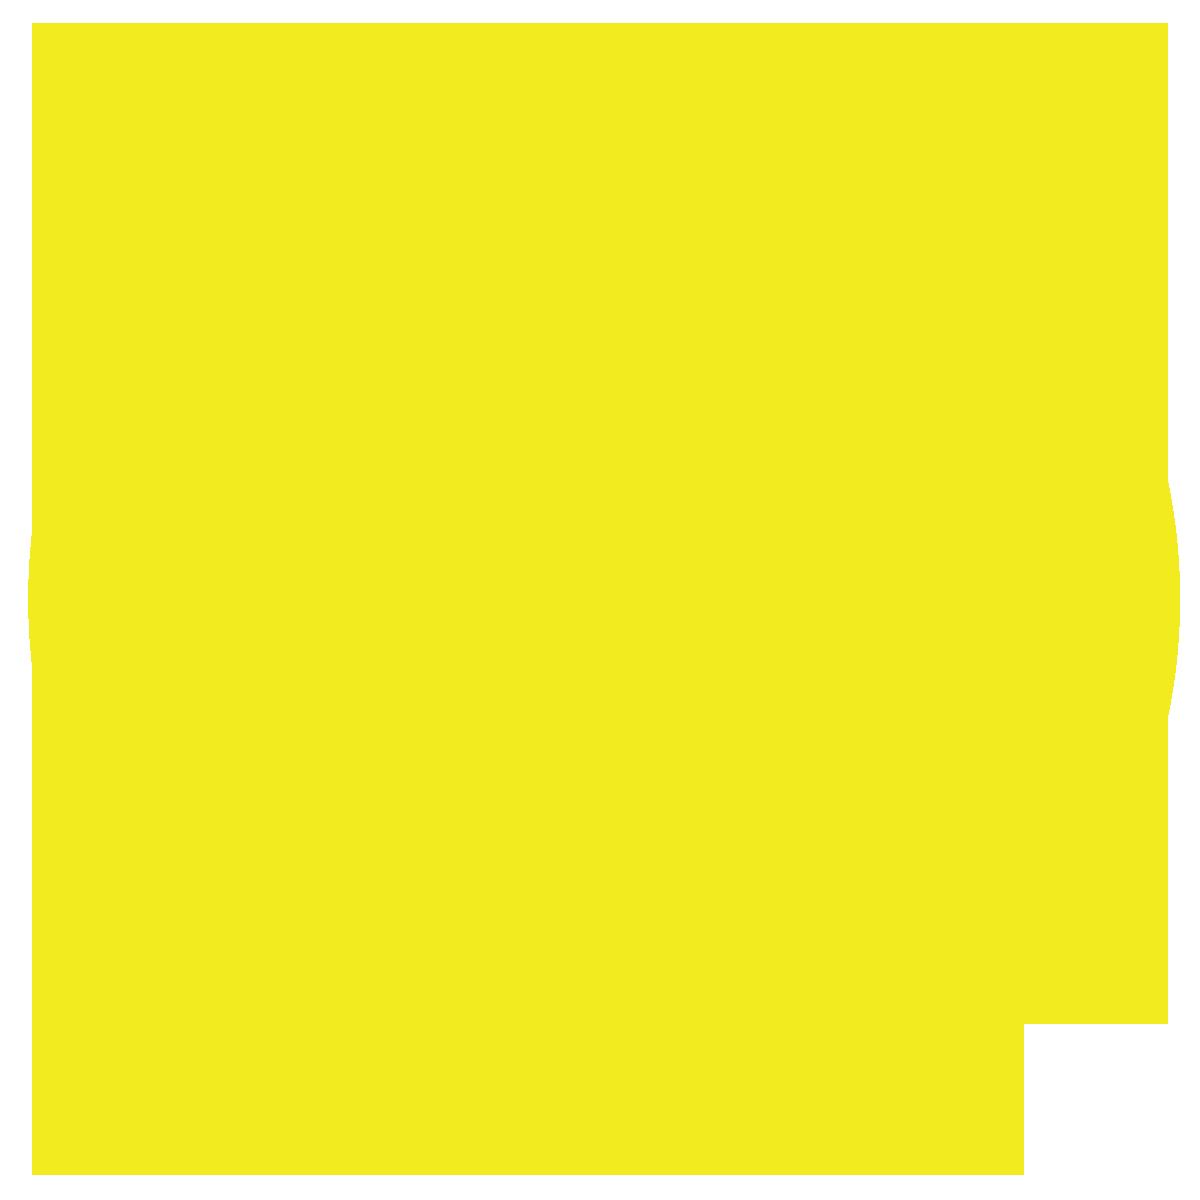 Solar panel icon on yellow background